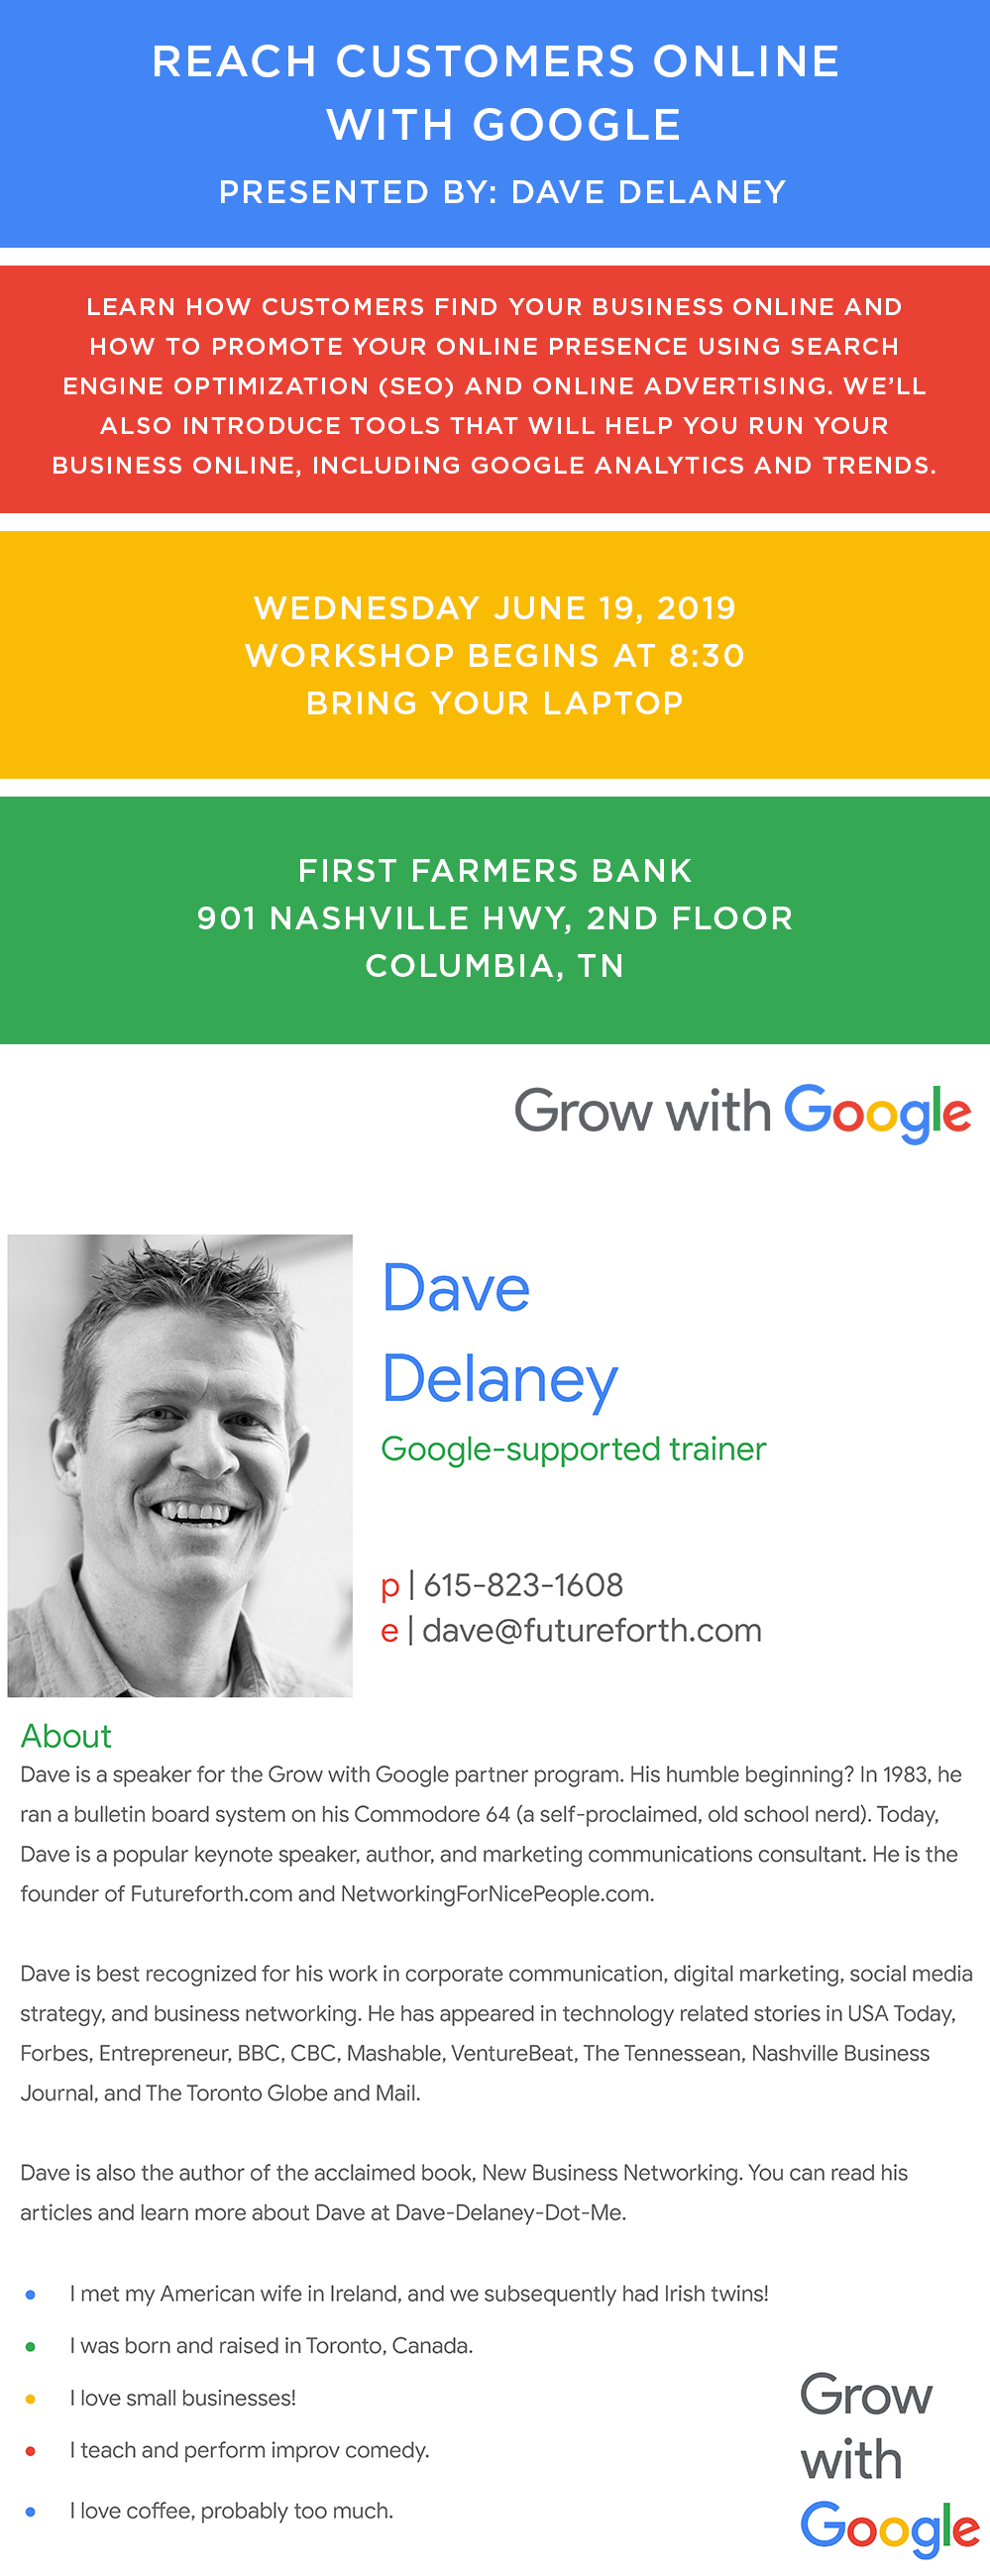 Reach Customers Online with Google - Jun 19, 2019 - Maury Alliance